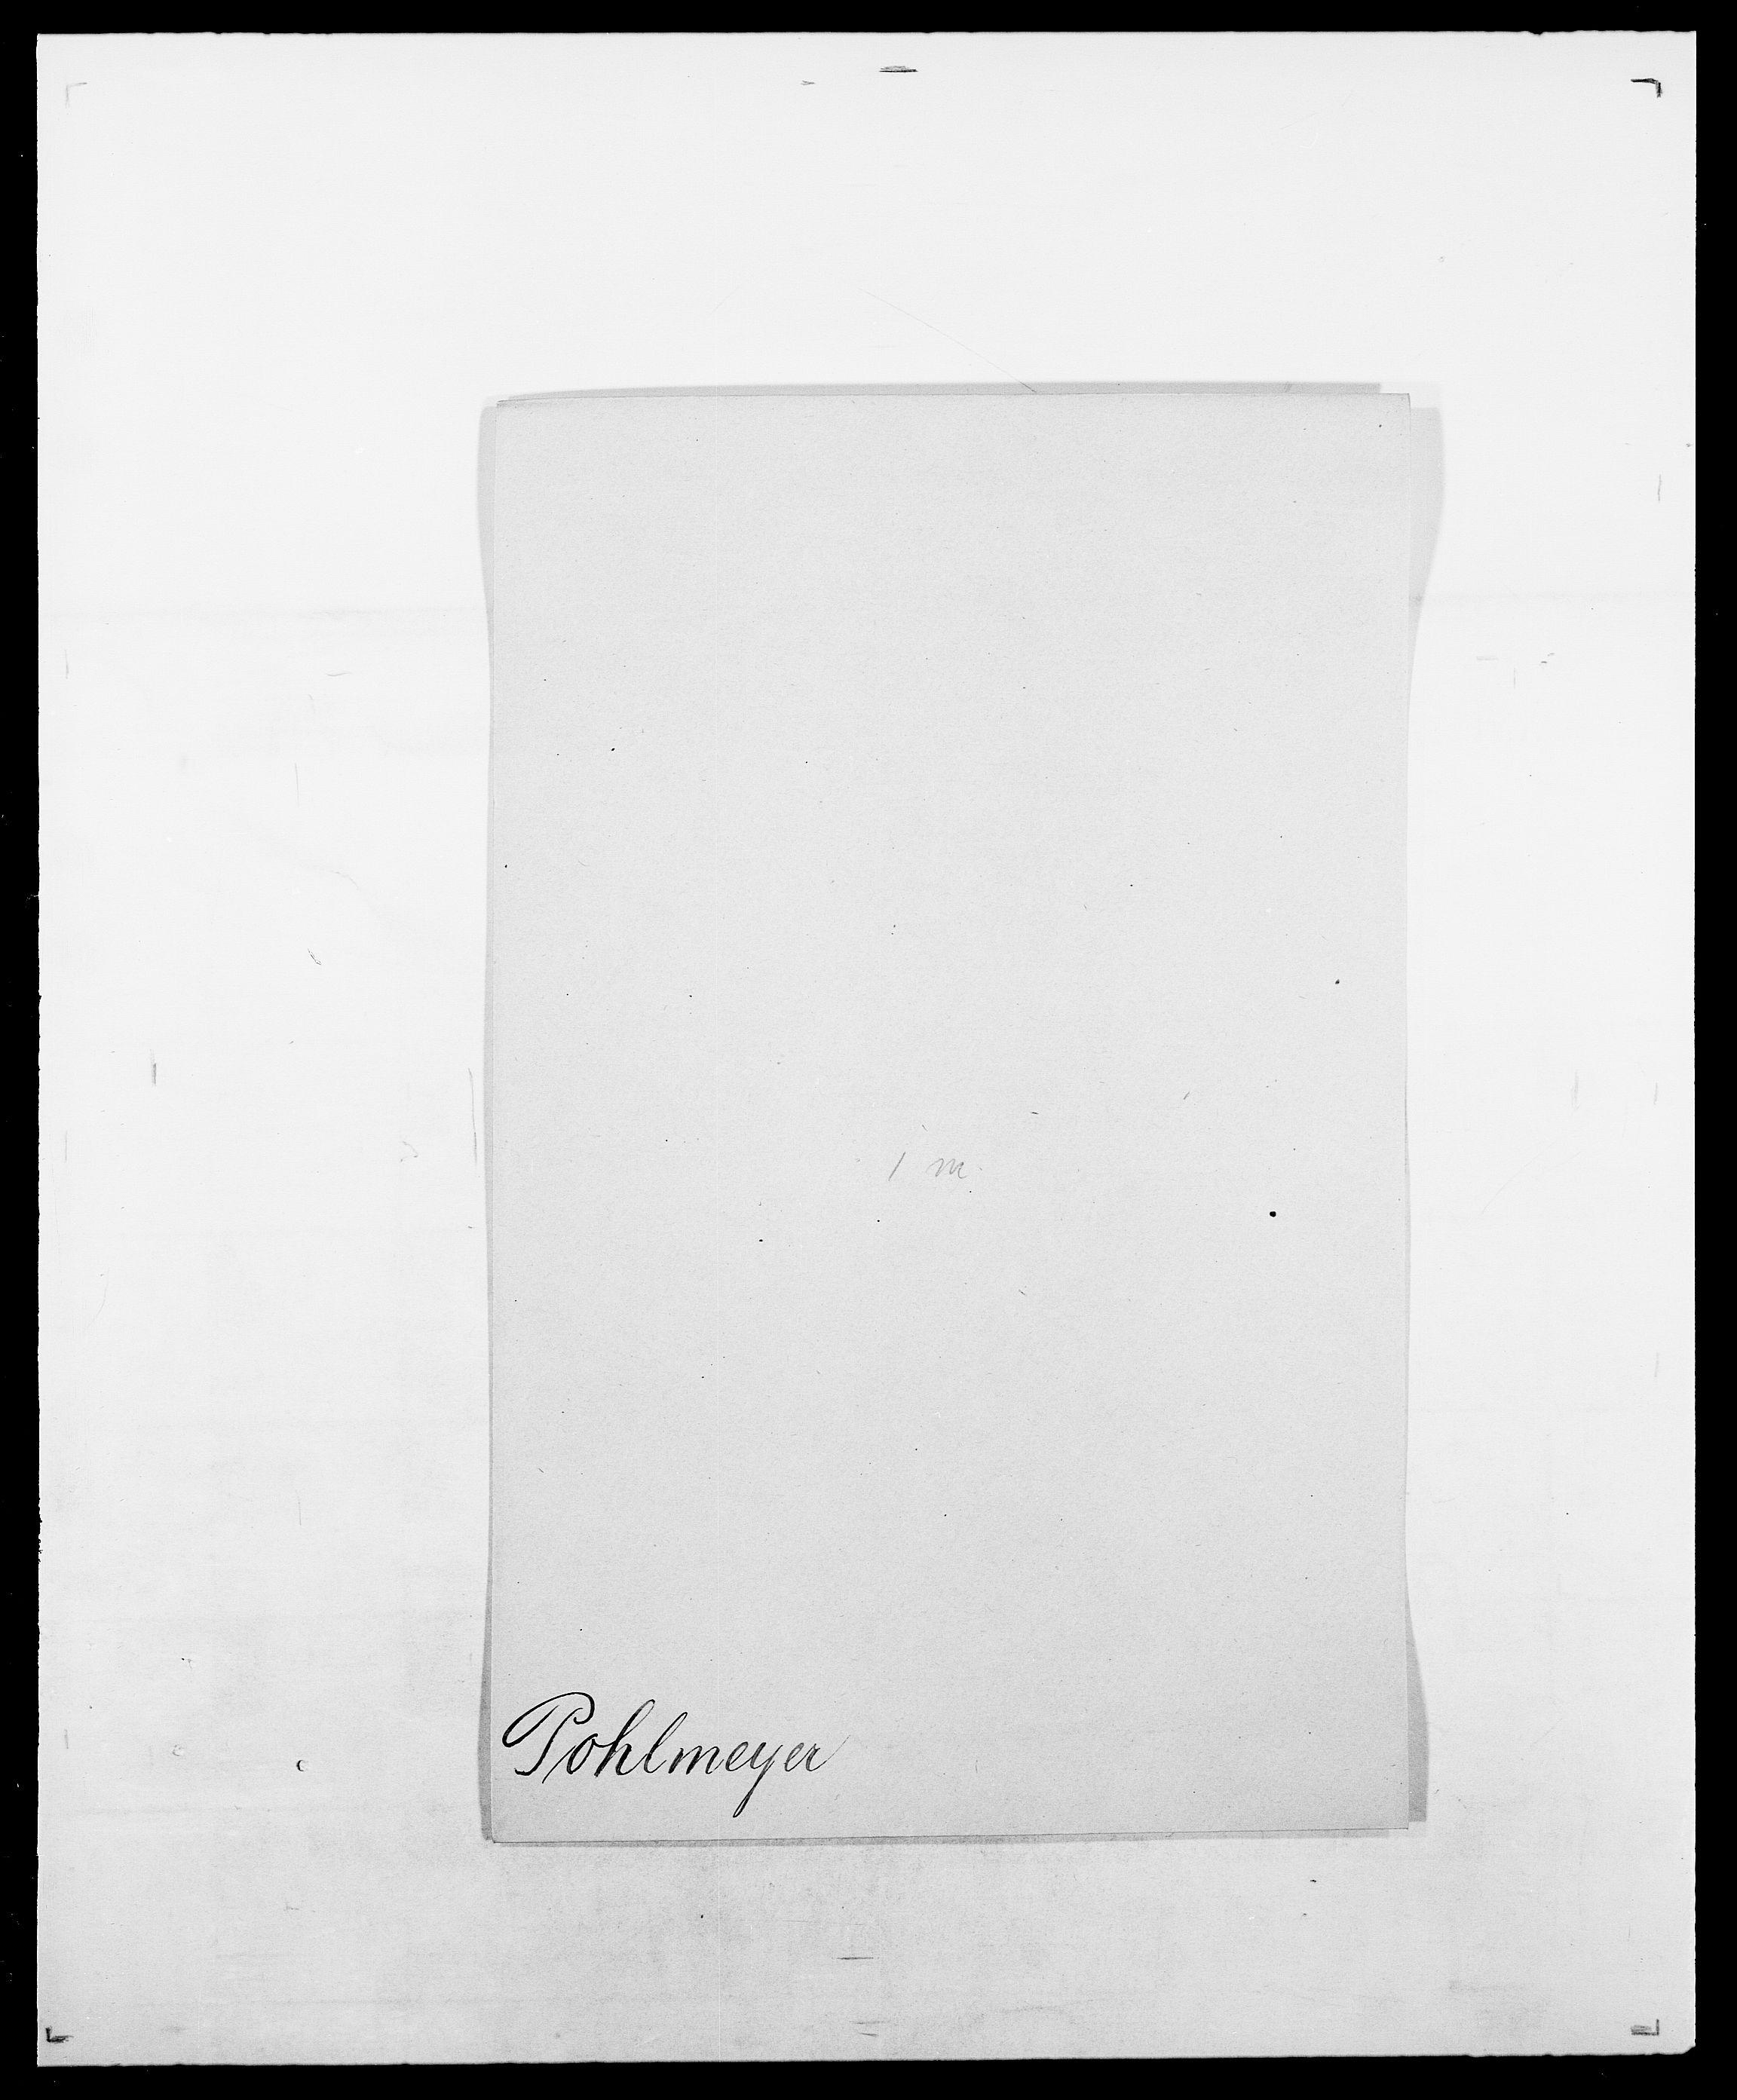 SAO, Delgobe, Charles Antoine - samling, D/Da/L0031: de Place - Raaum, s. 192